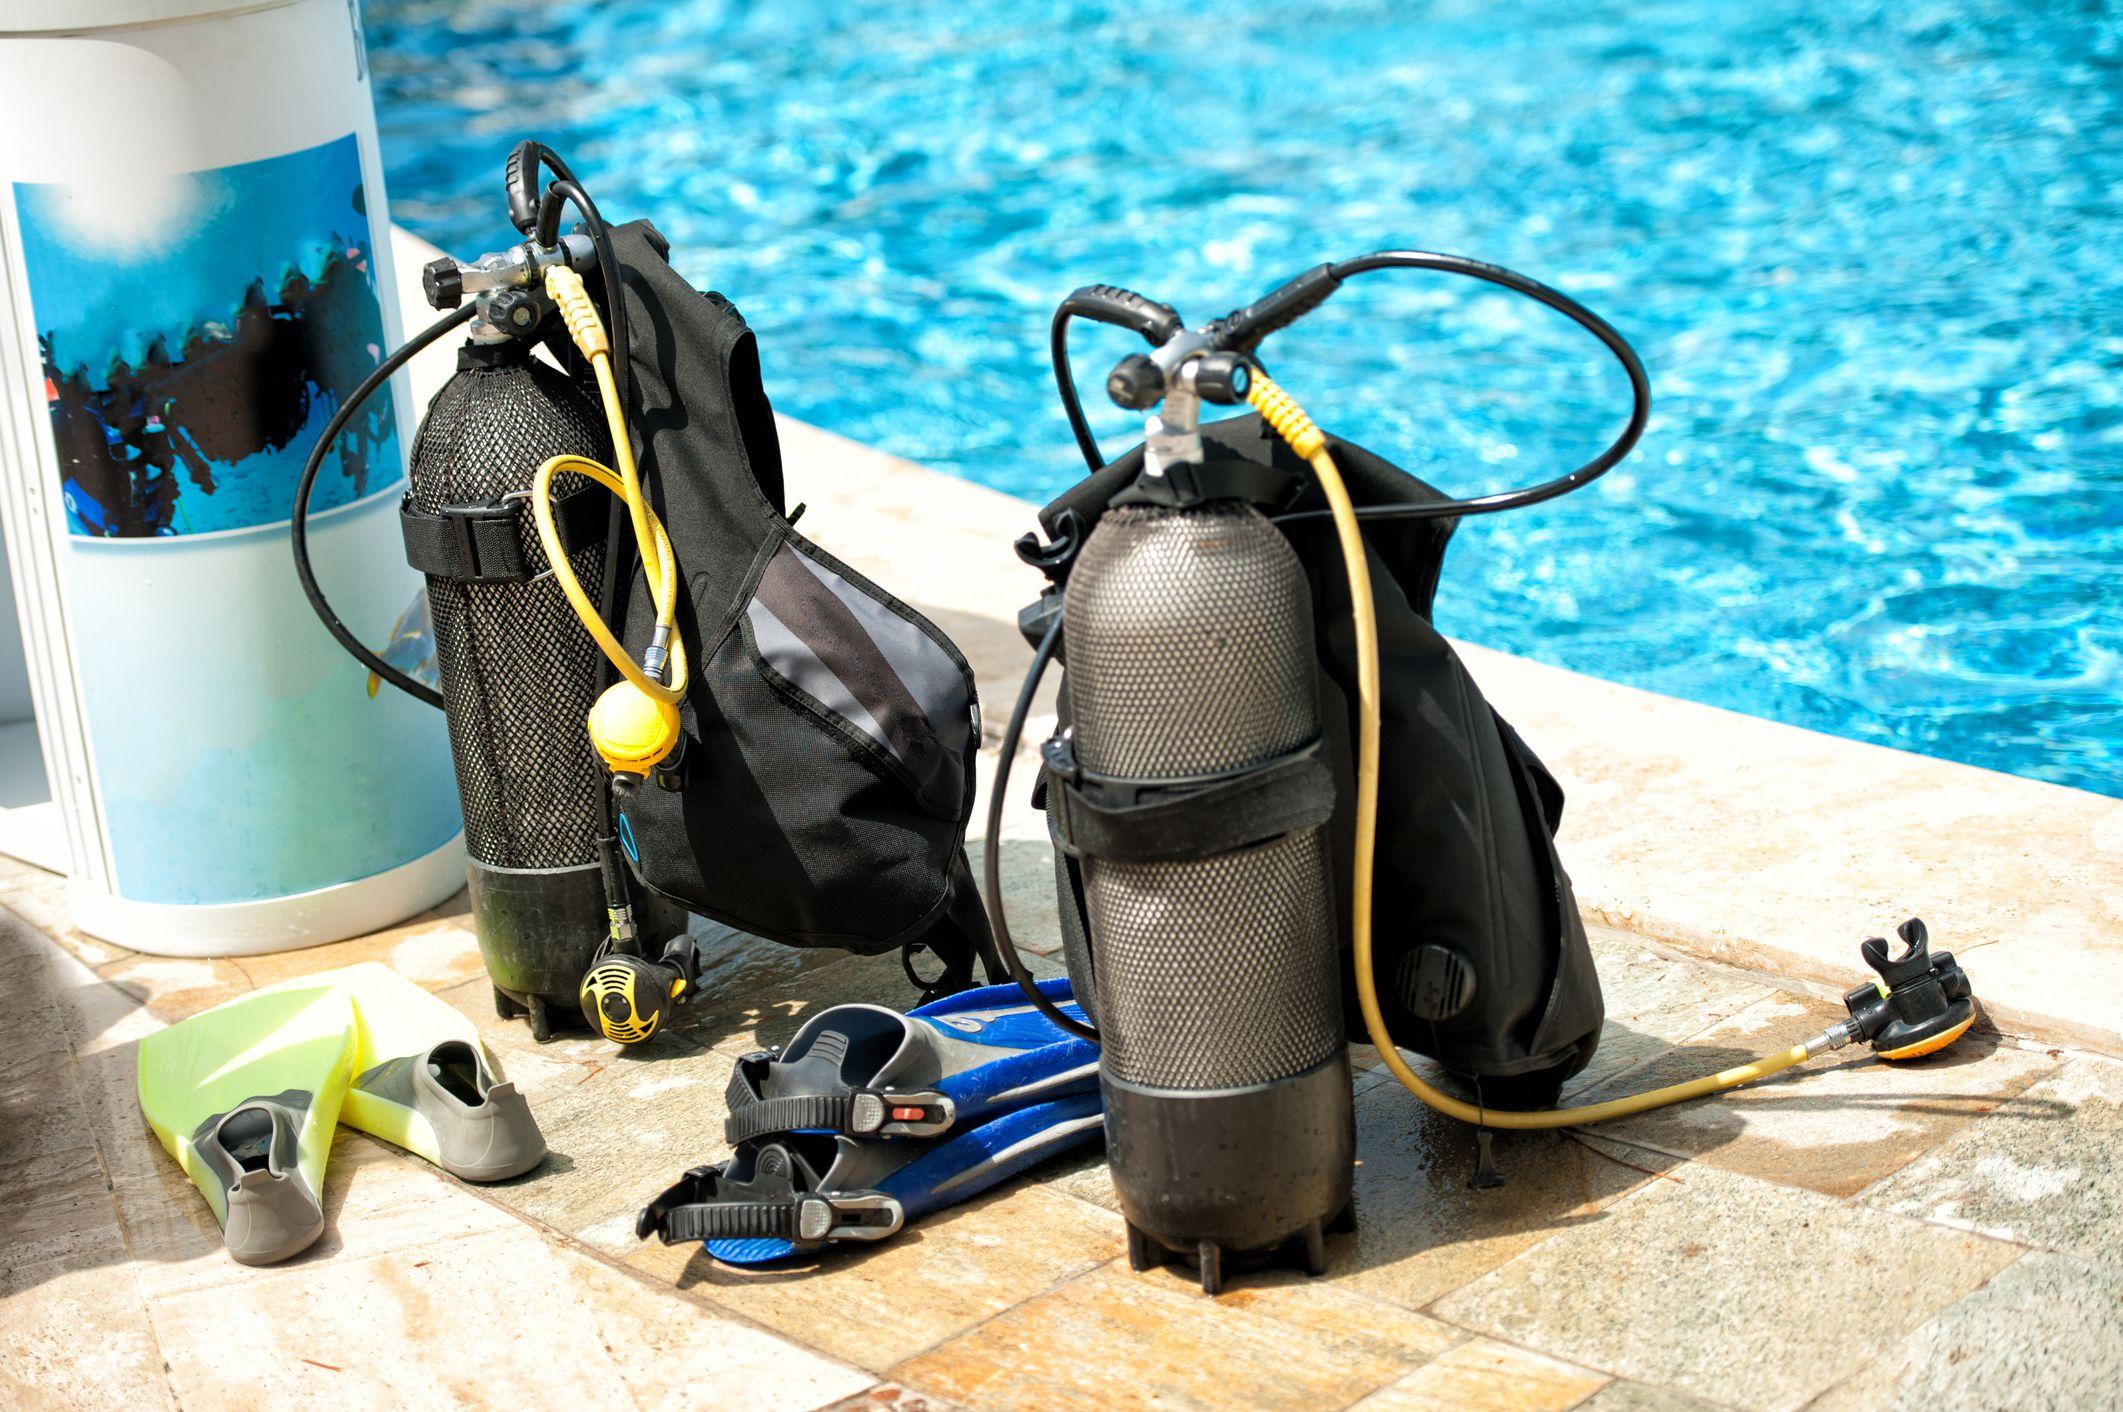 What You Breathe When Scuba Diving